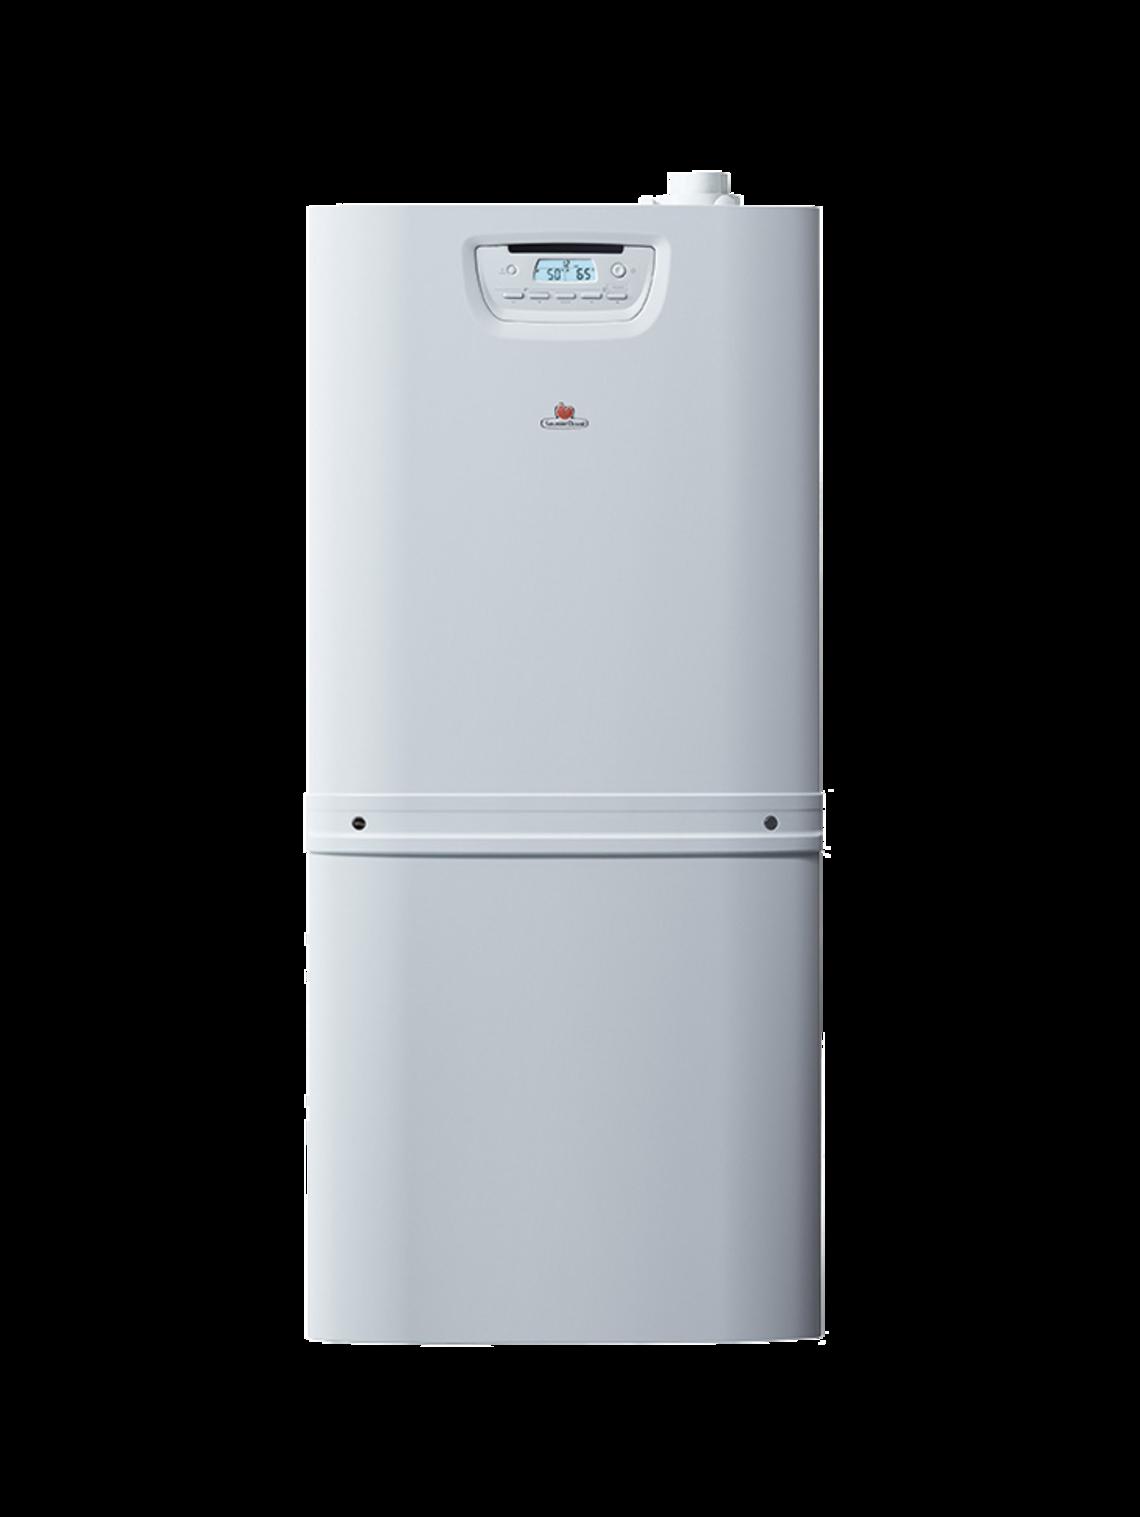 Duomax Condens - 90 litres